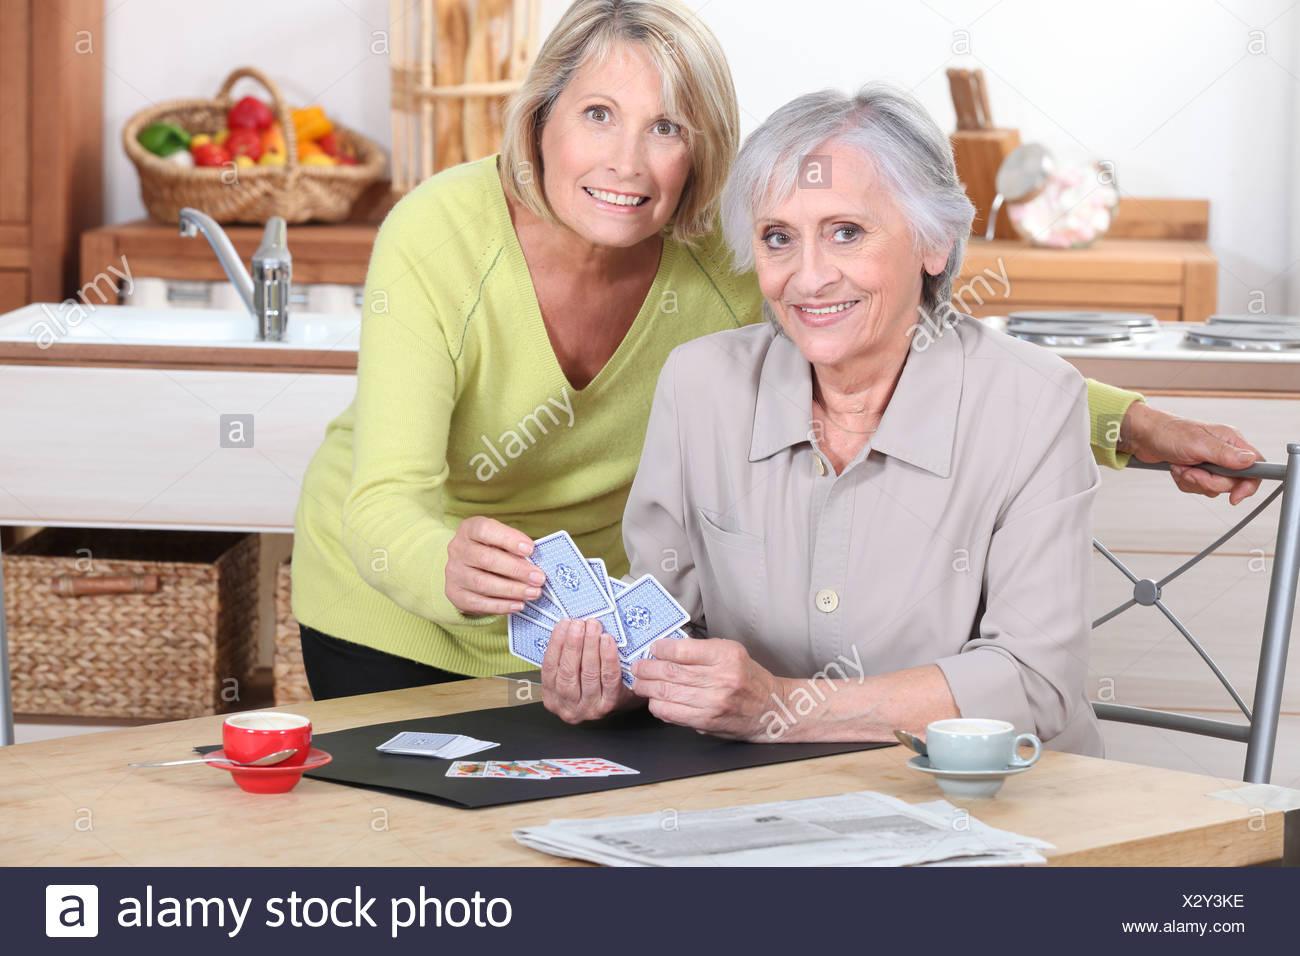 Two mature woman playing around